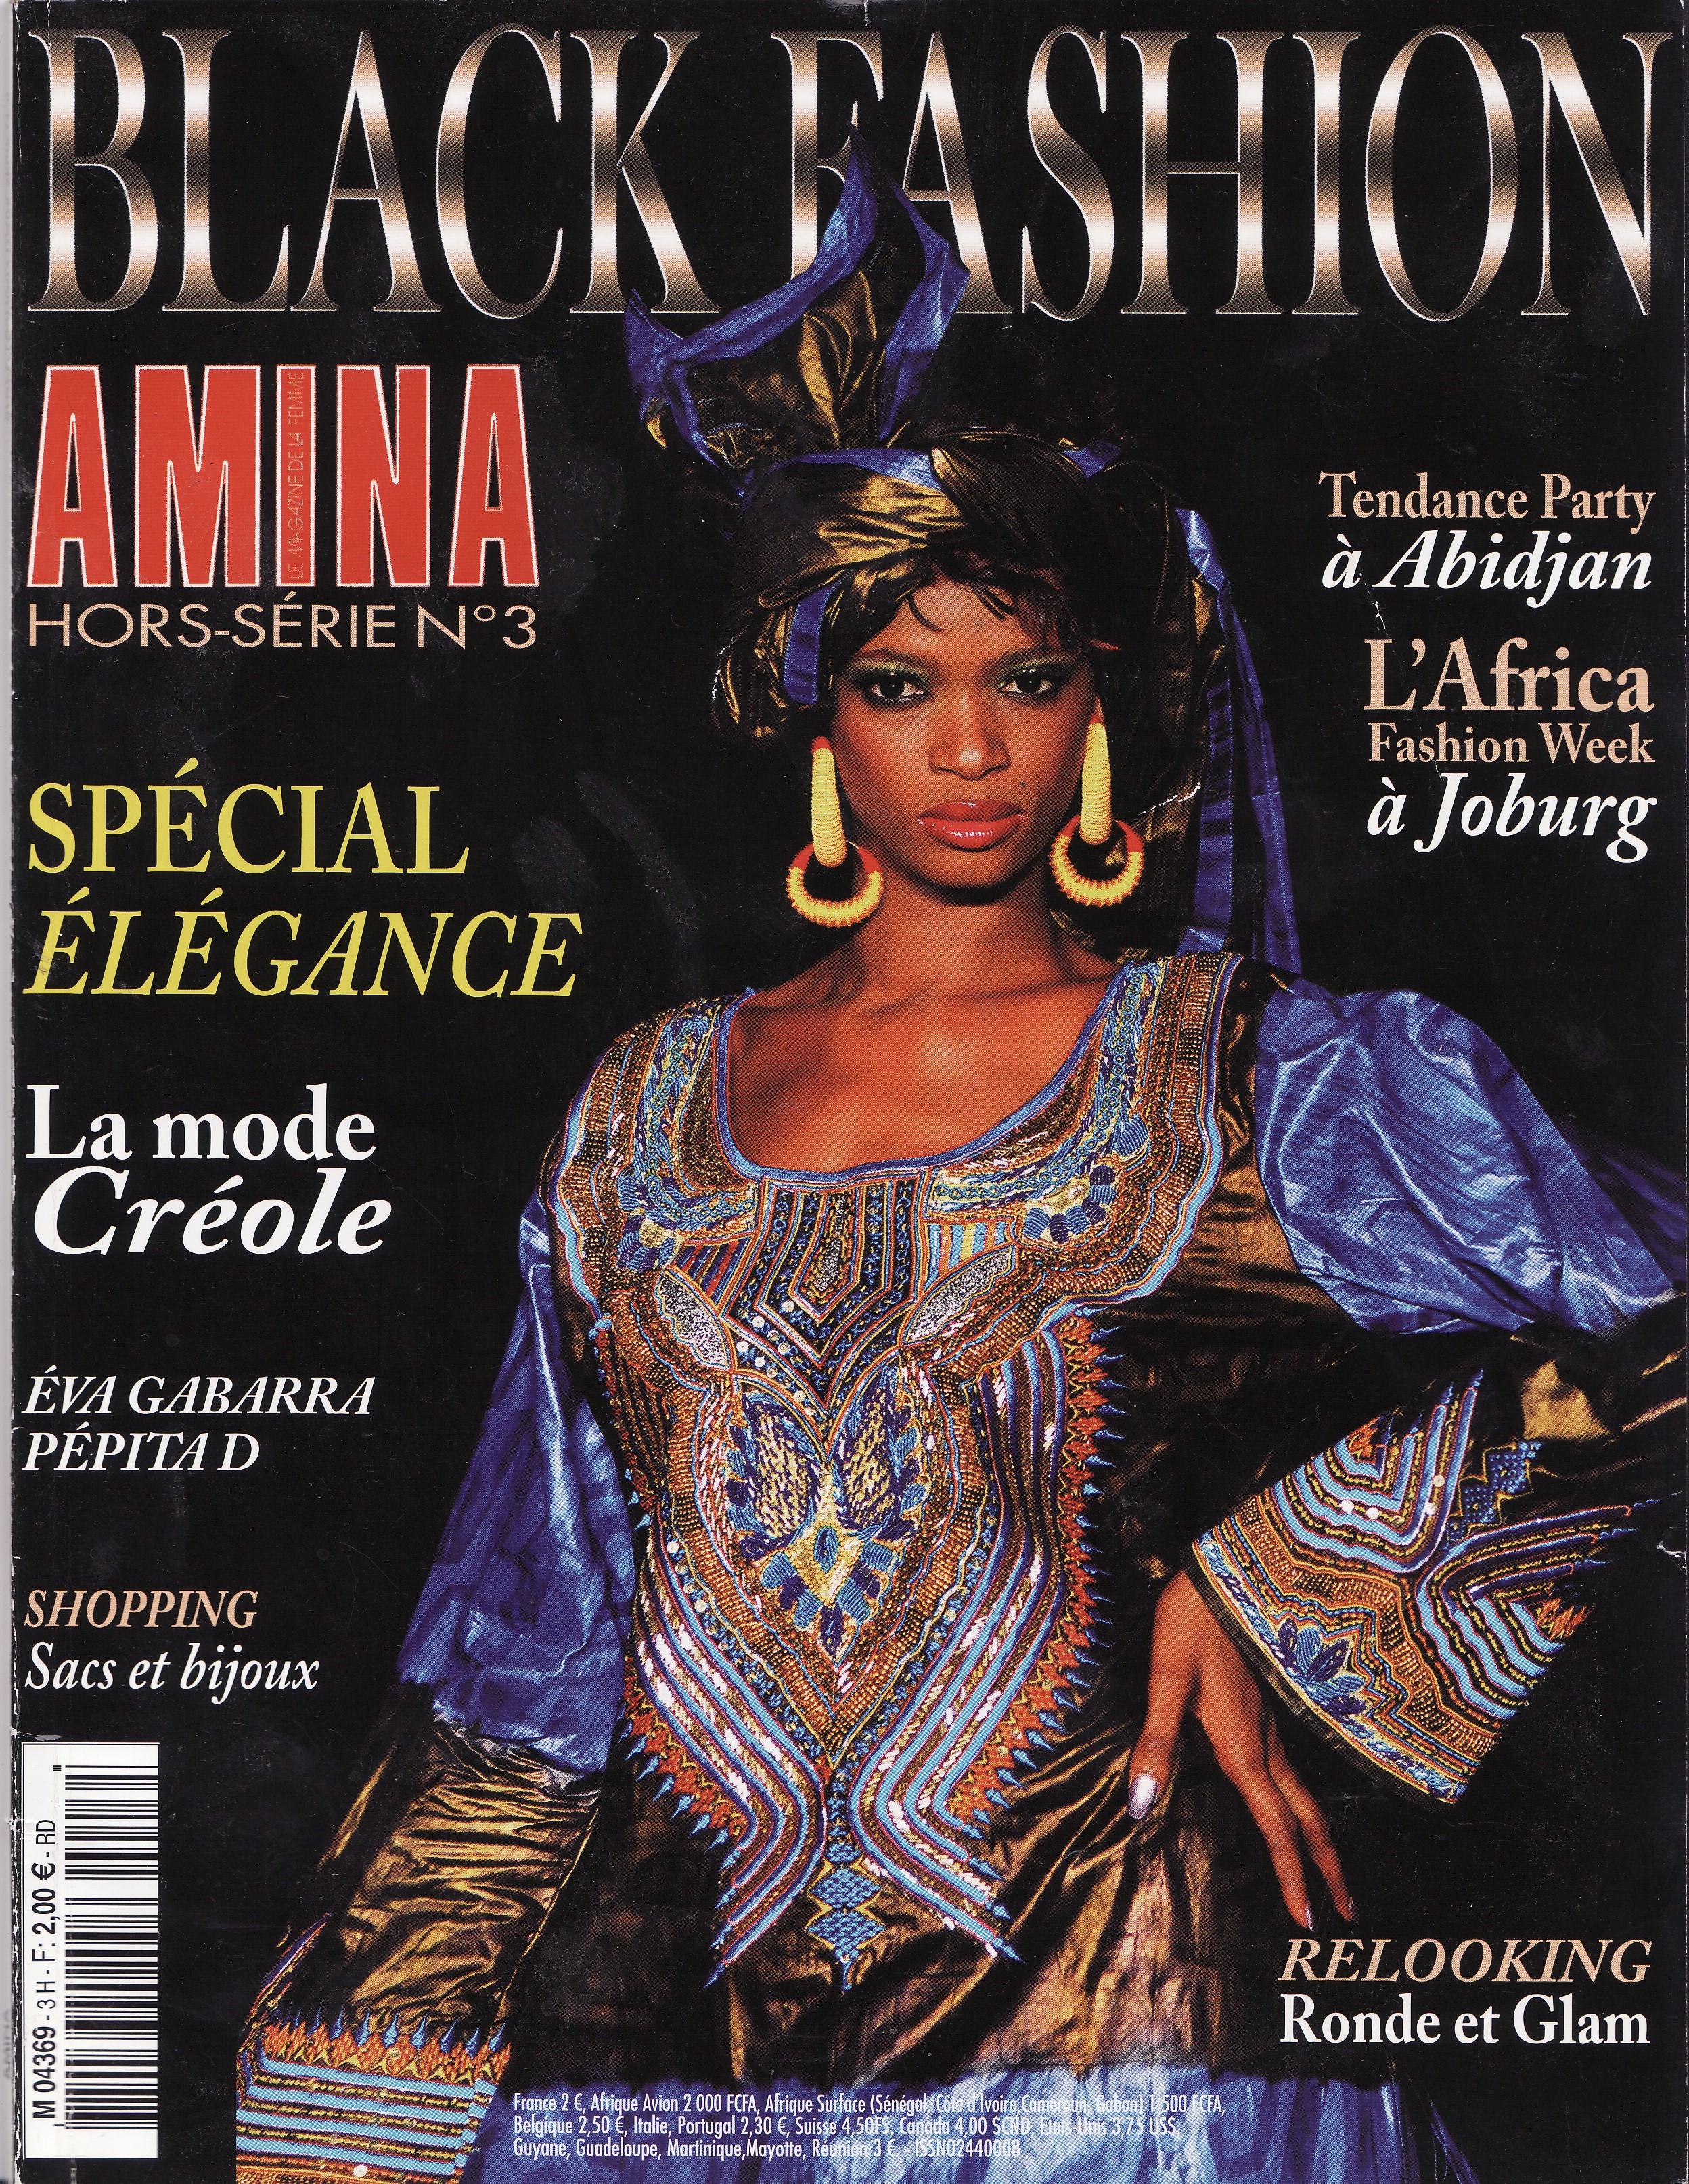 AMMINA BLACK FASHION 2011